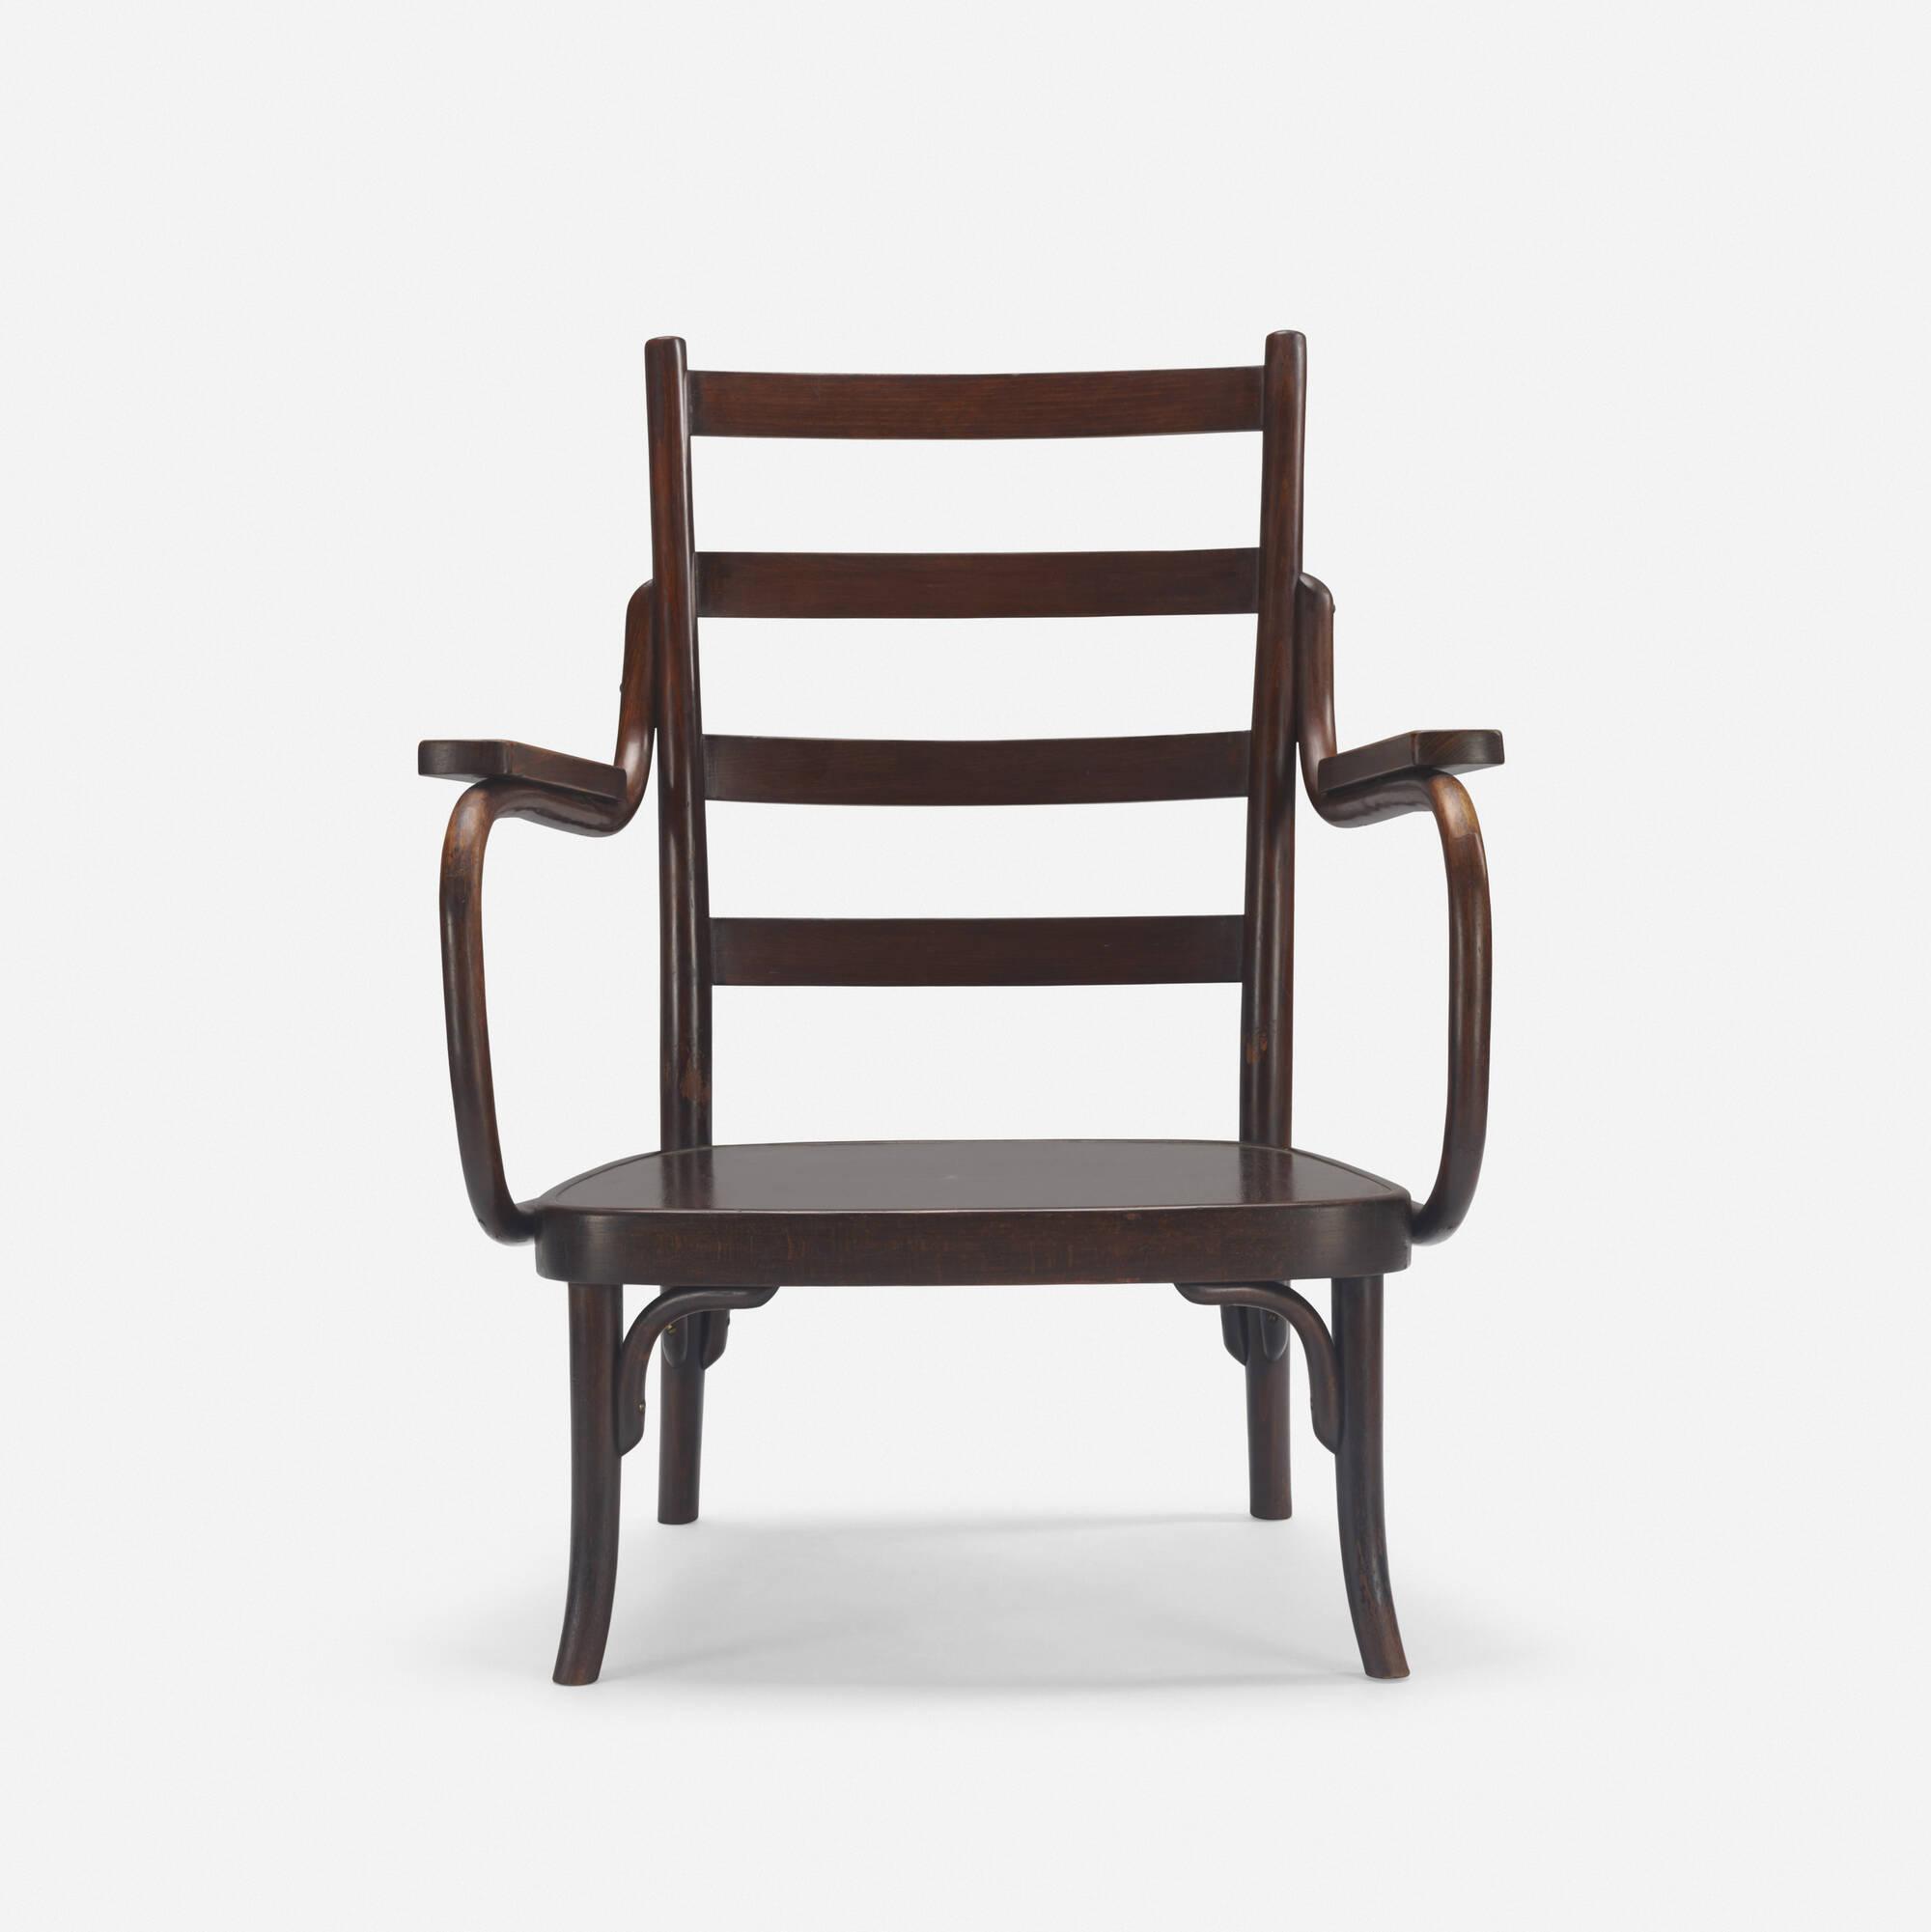 241: Josef Frank / armchair, model A403F (2 of 5)